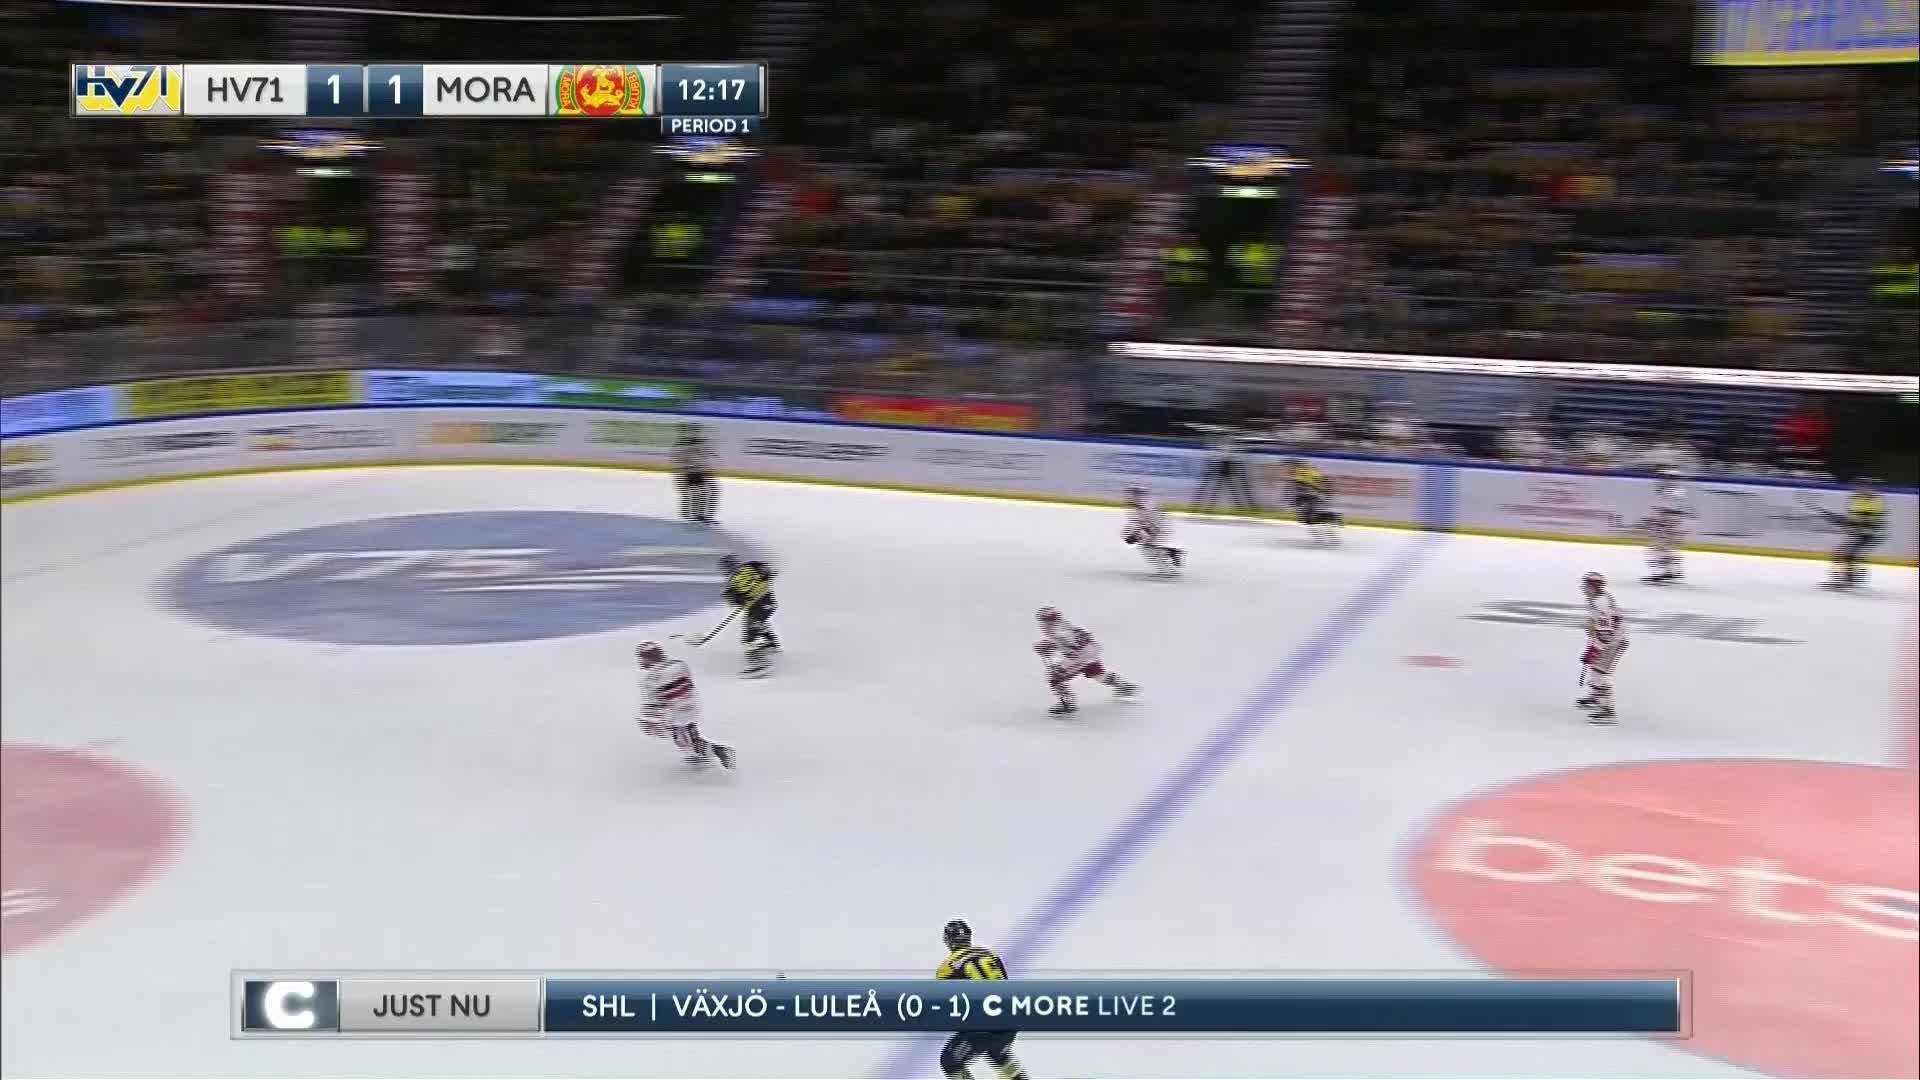 HV71 - Mora IK 2-1